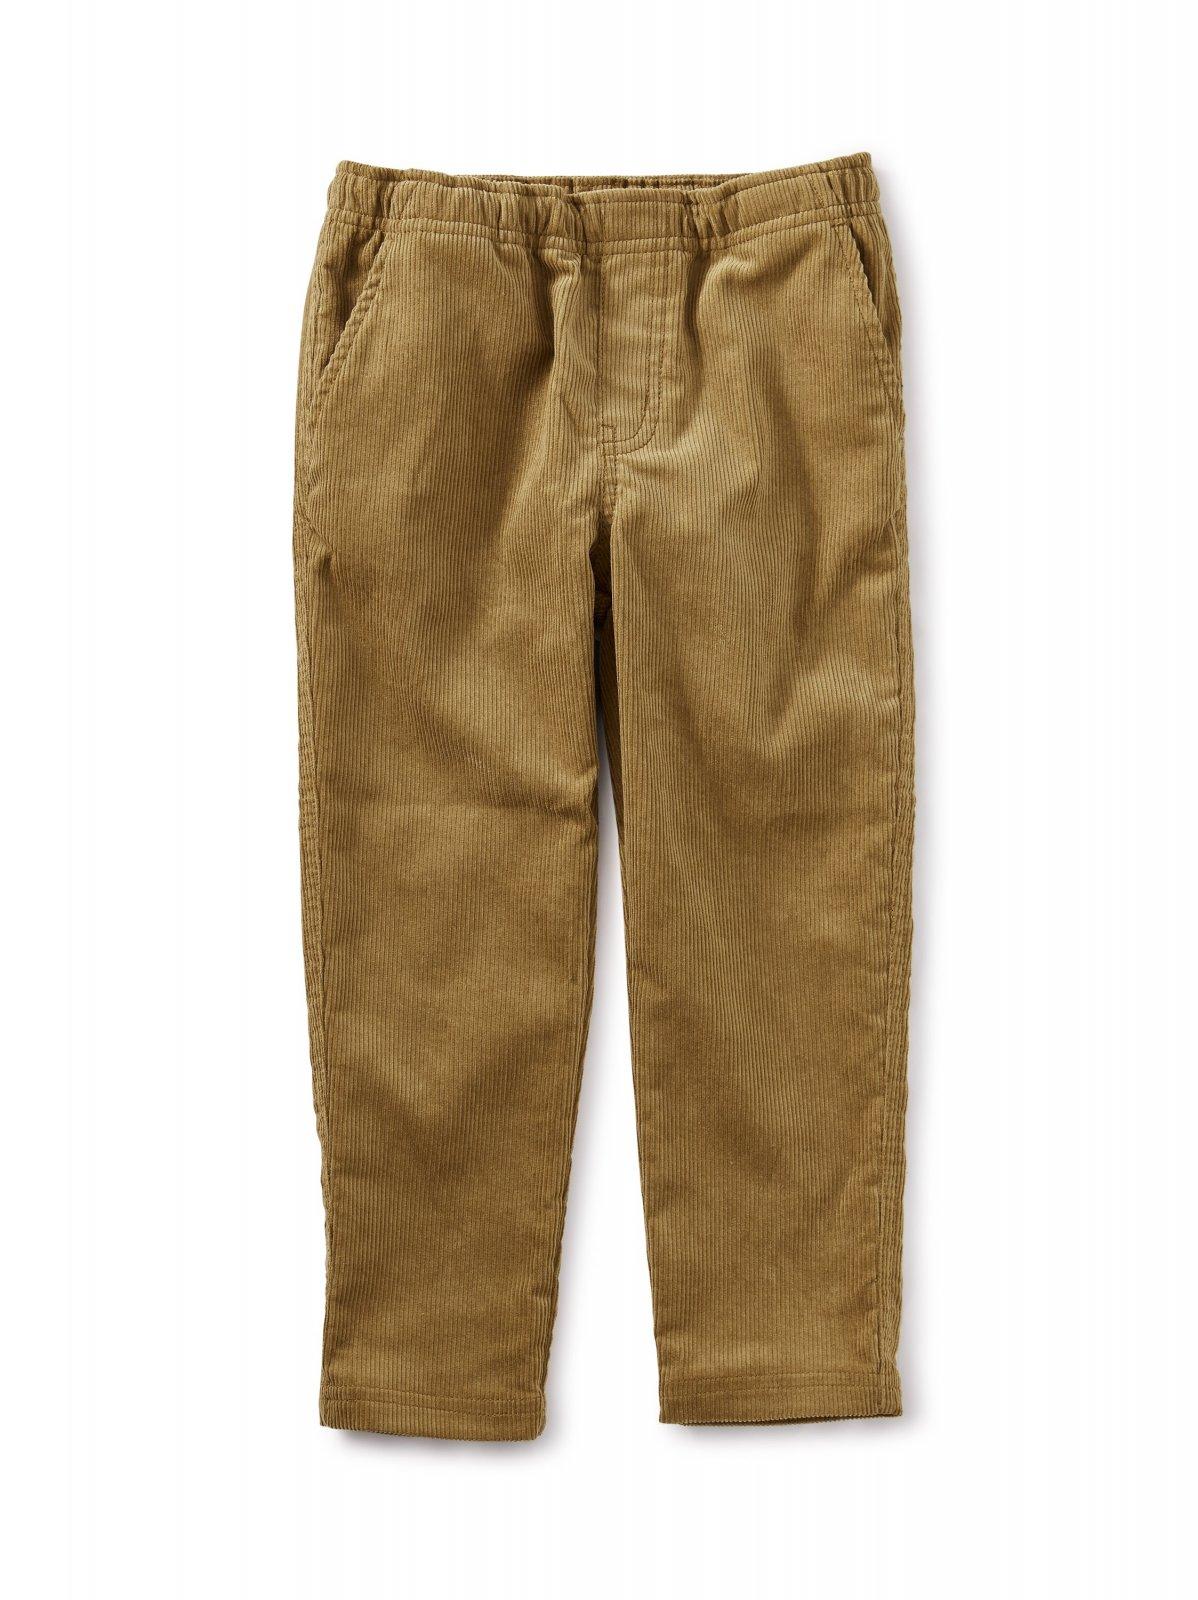 Boy's Corduroy Pant in Raw Umber by Tea